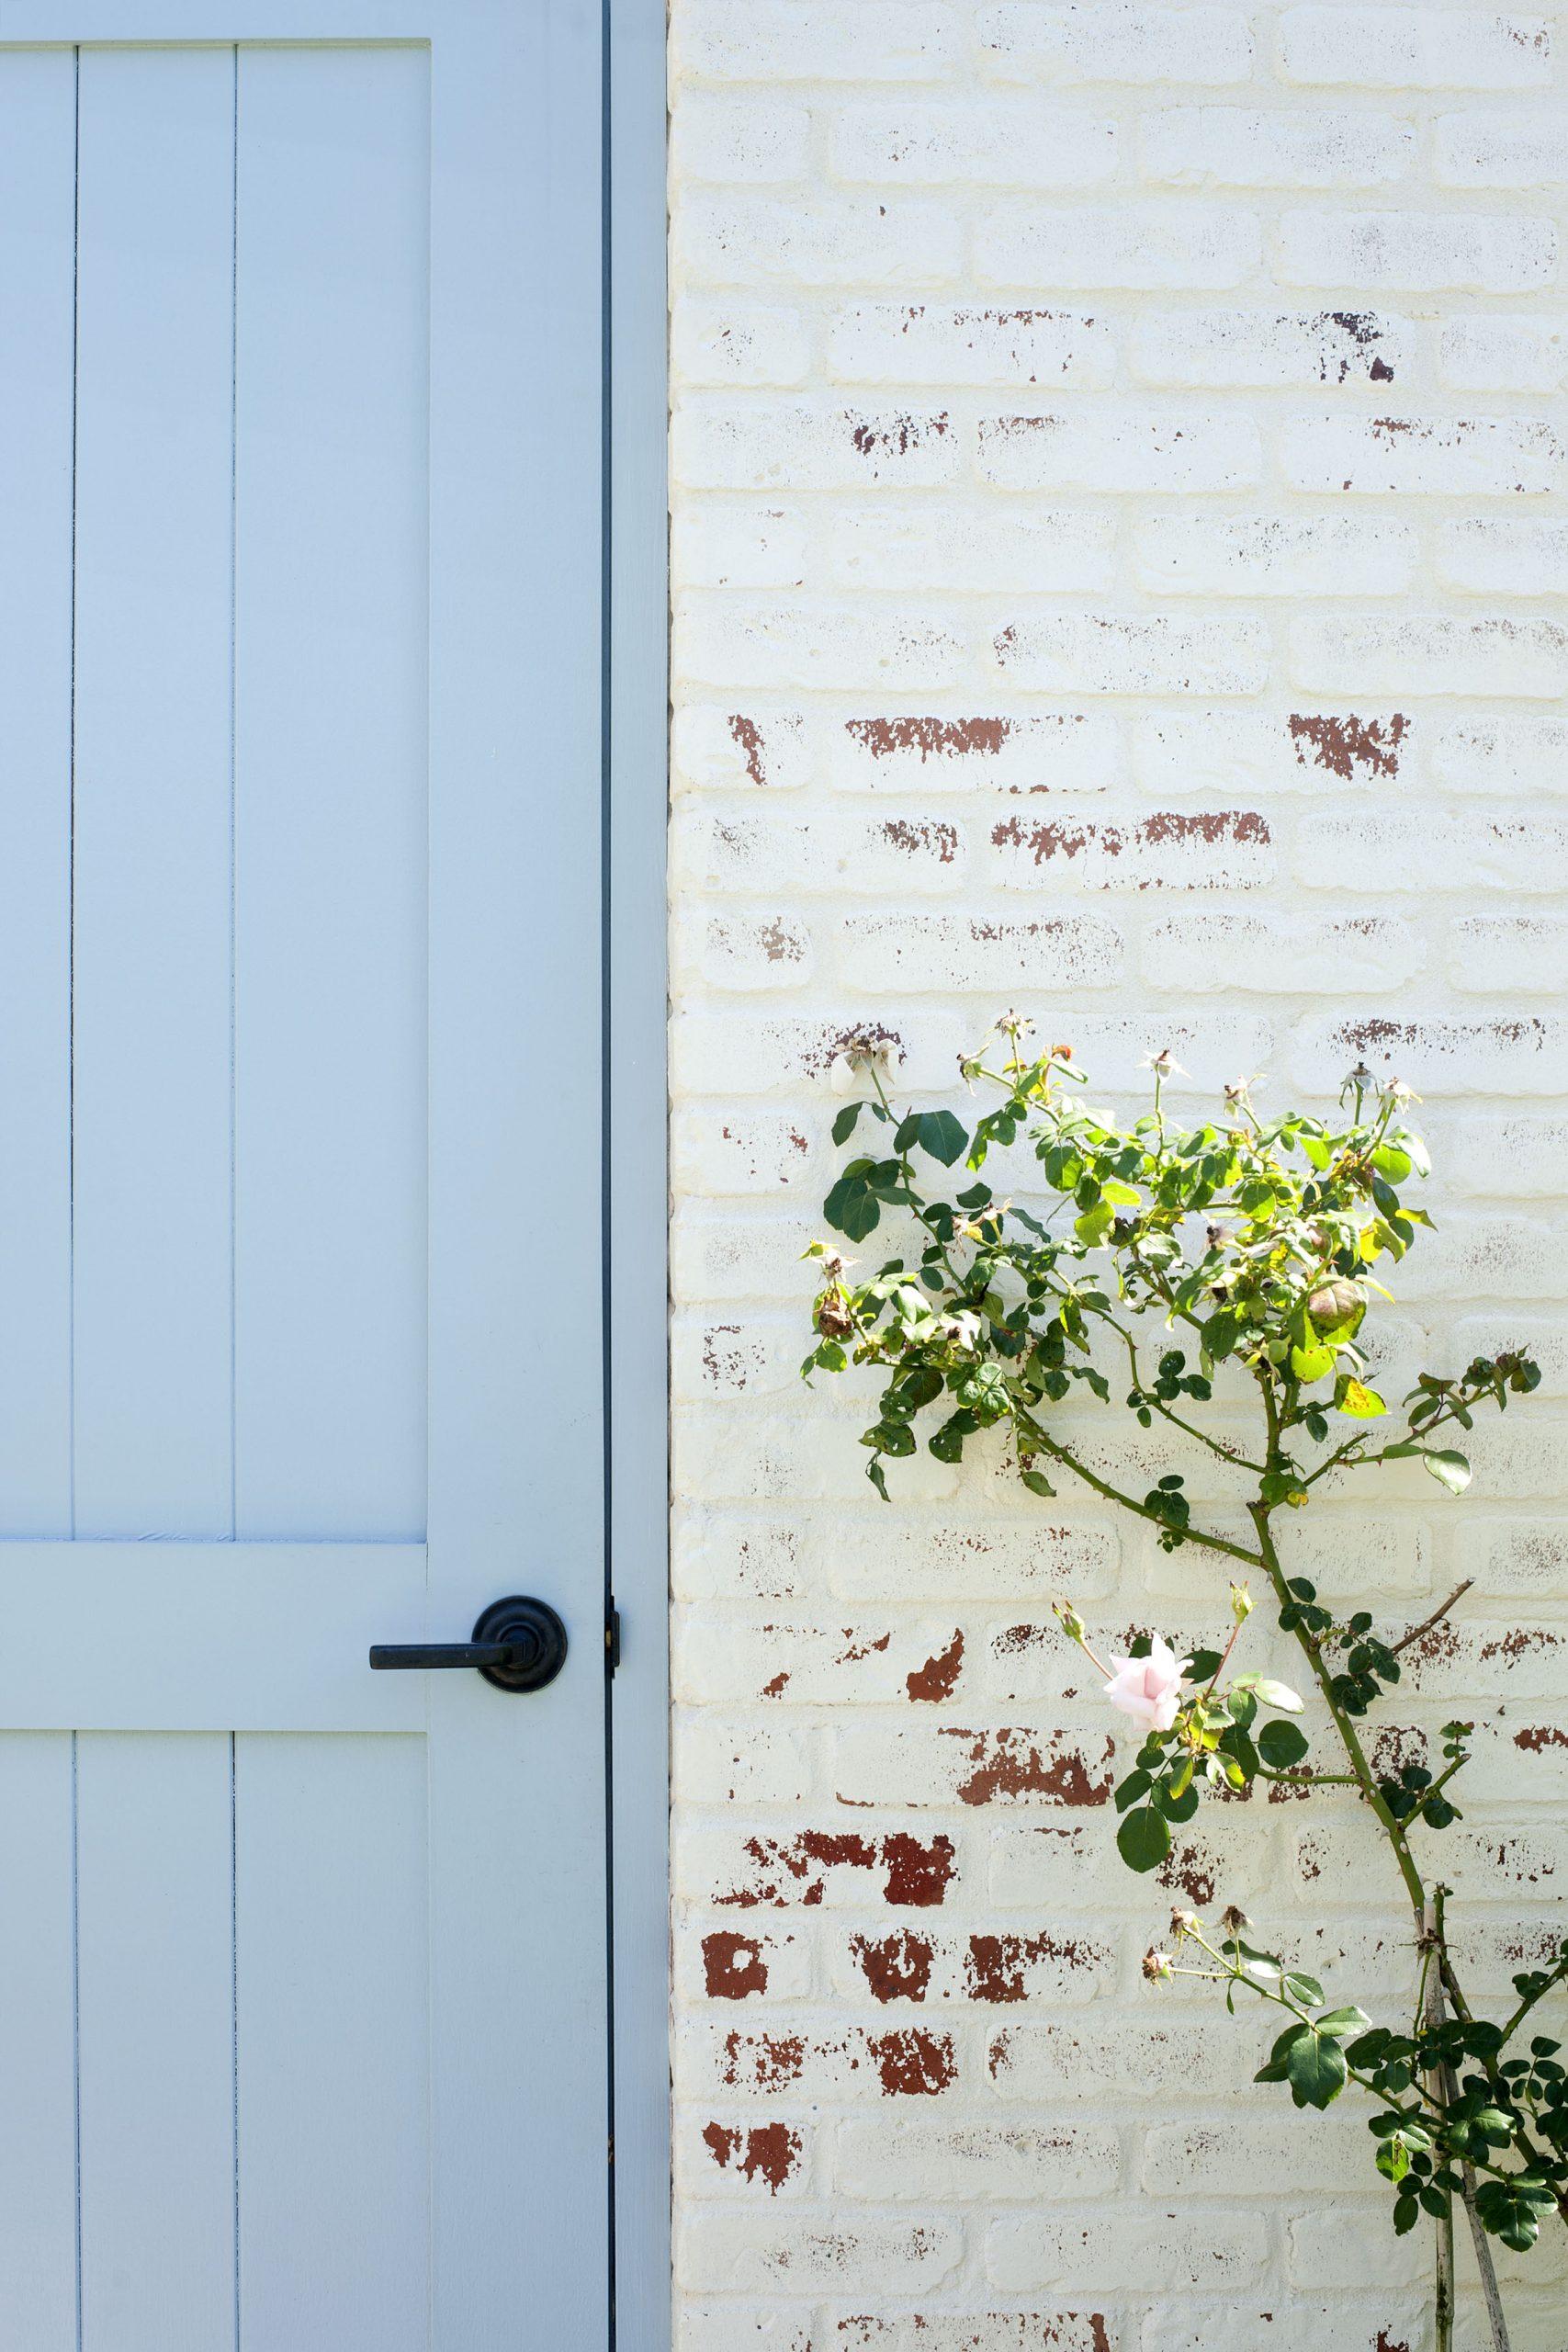 Heller_Badilla-Painters_77-Gin-Lane-Southampton-9-19-13_9589